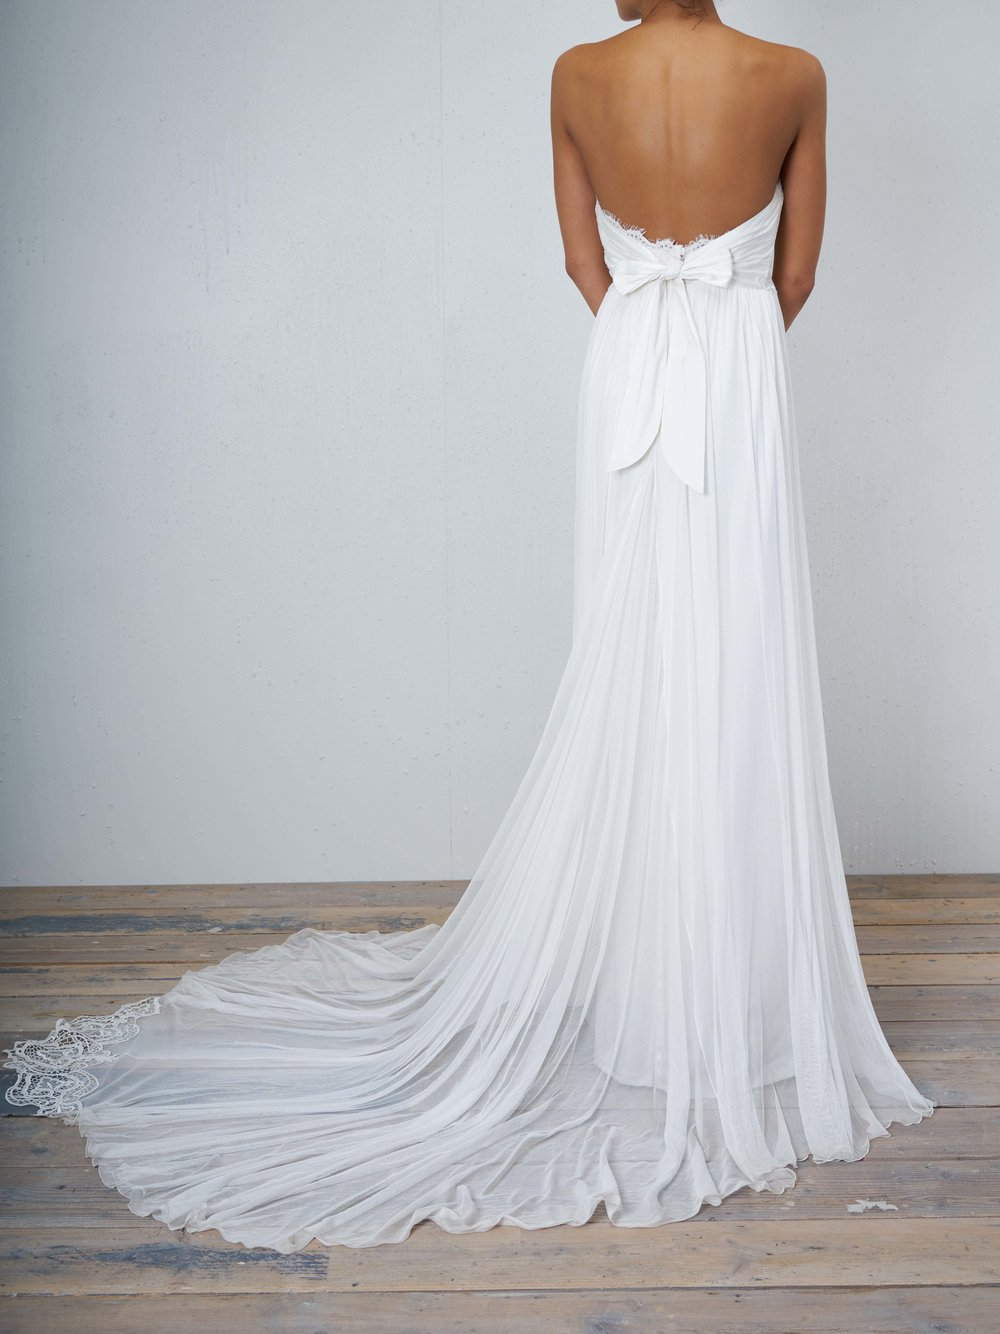 Brooklyn Dress4005edited.jpg